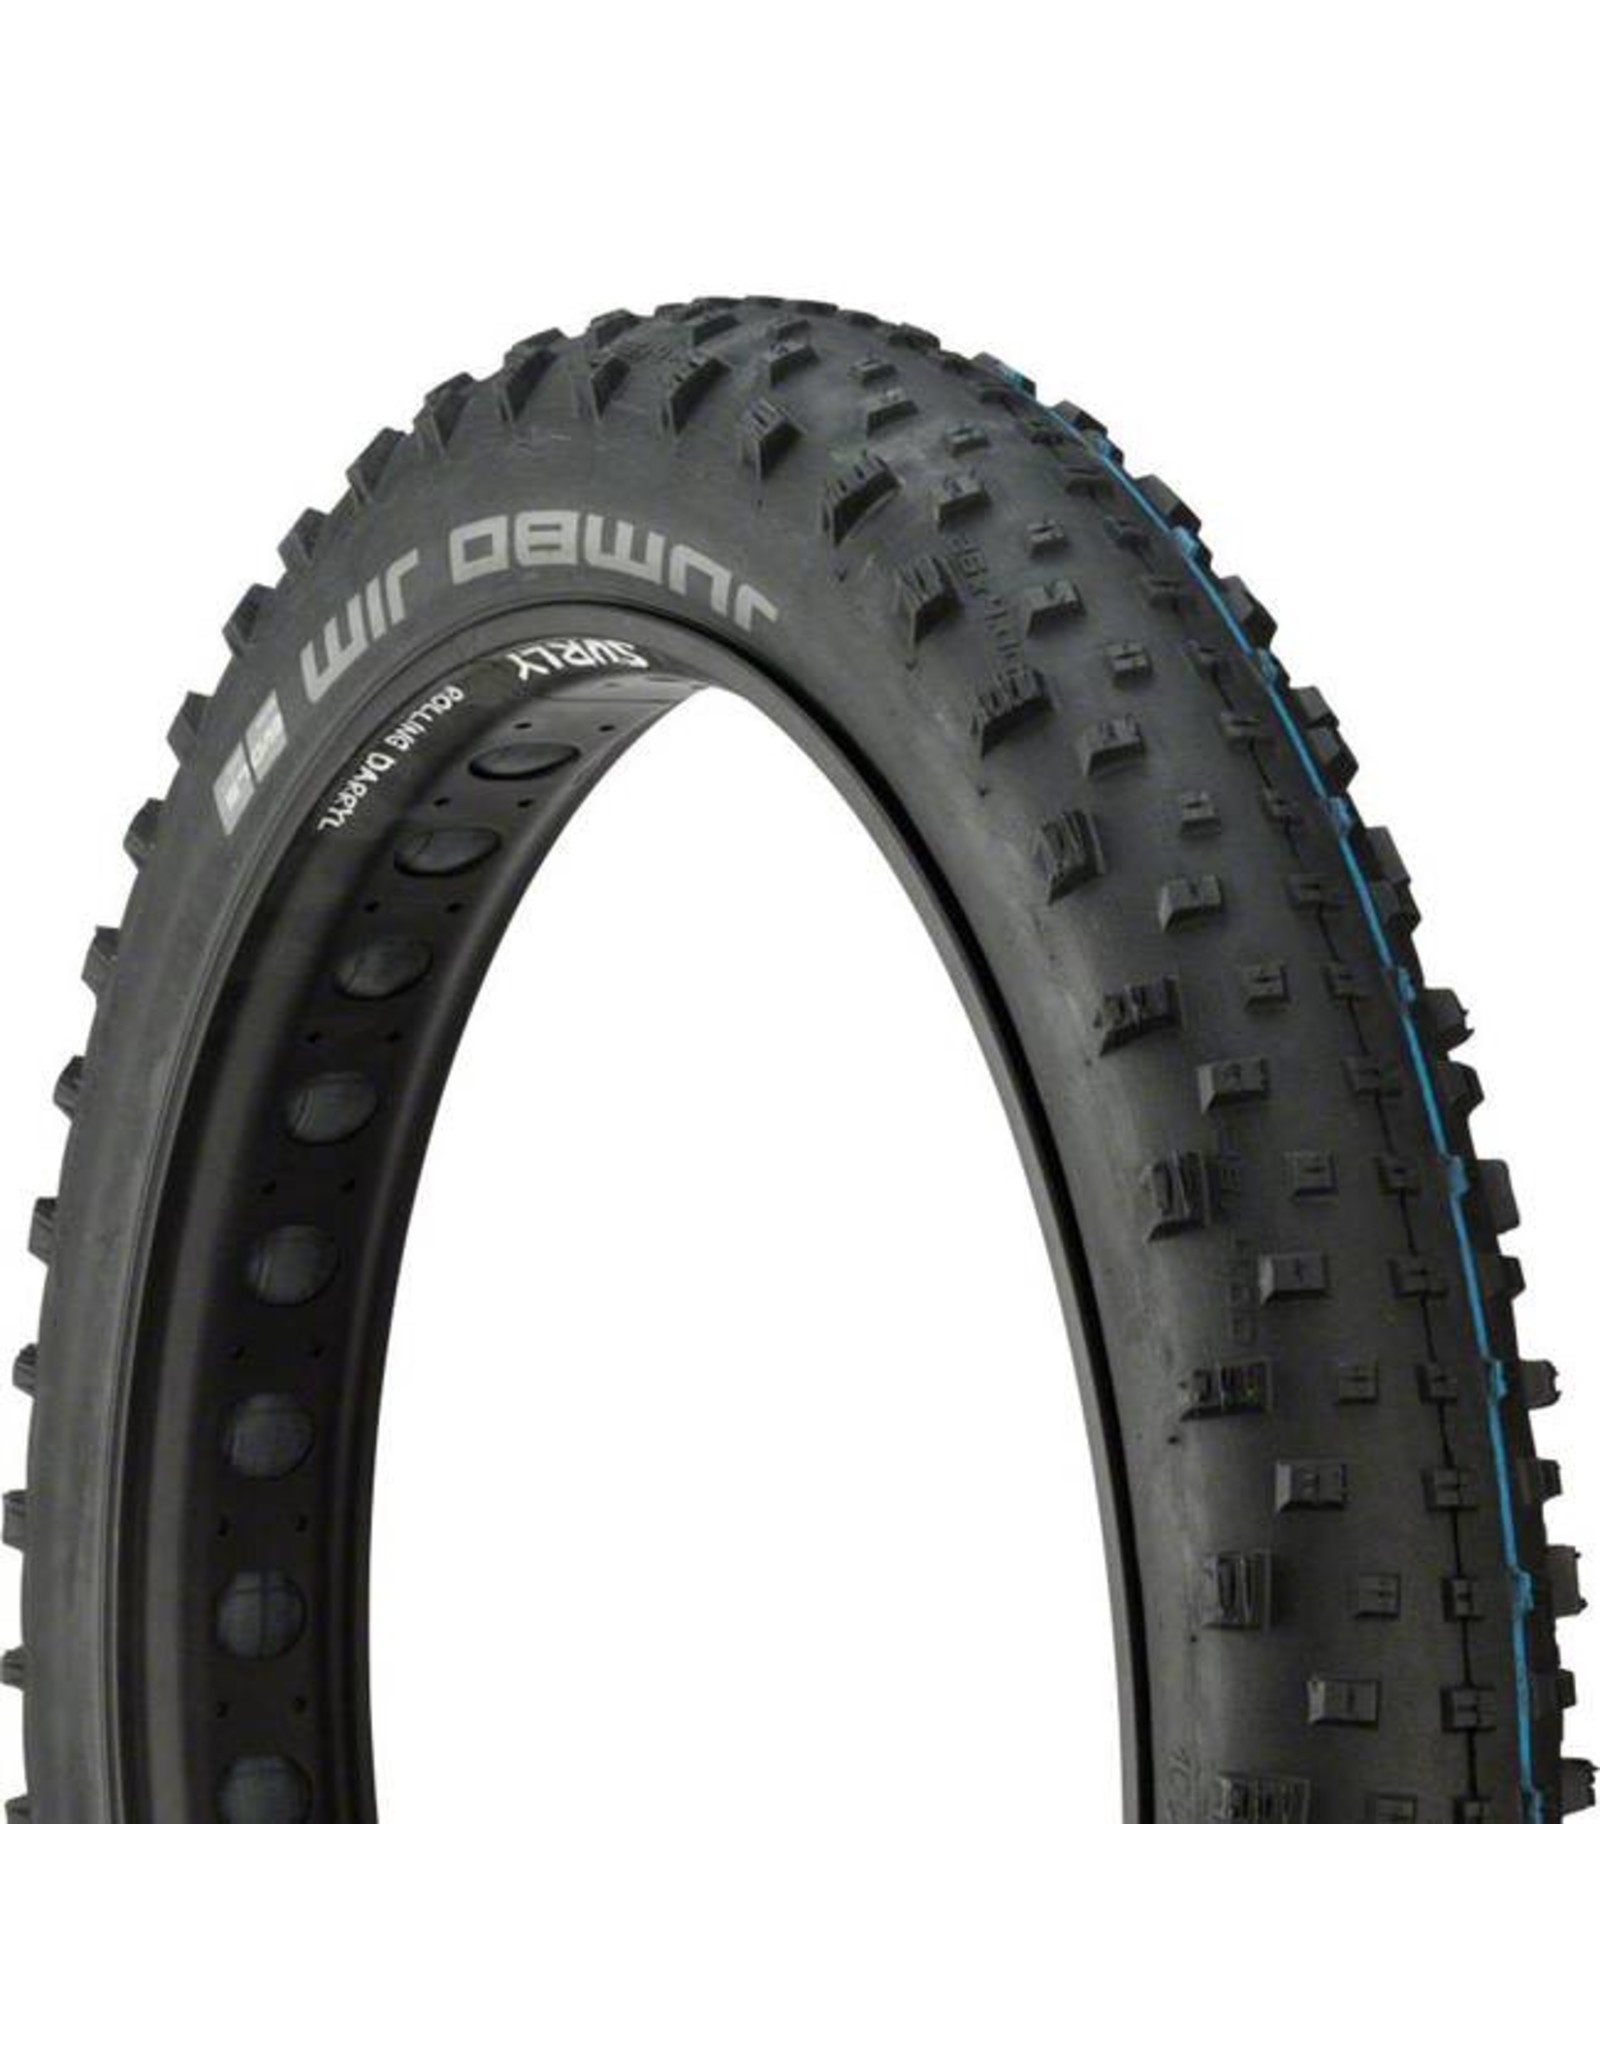 "Schwalbe Schwalbe Jumbo Jim Tire: 26 x 4.00"", Folding Bead, Evolution Line, Addix Speed Compound, LiteSkin, Black"